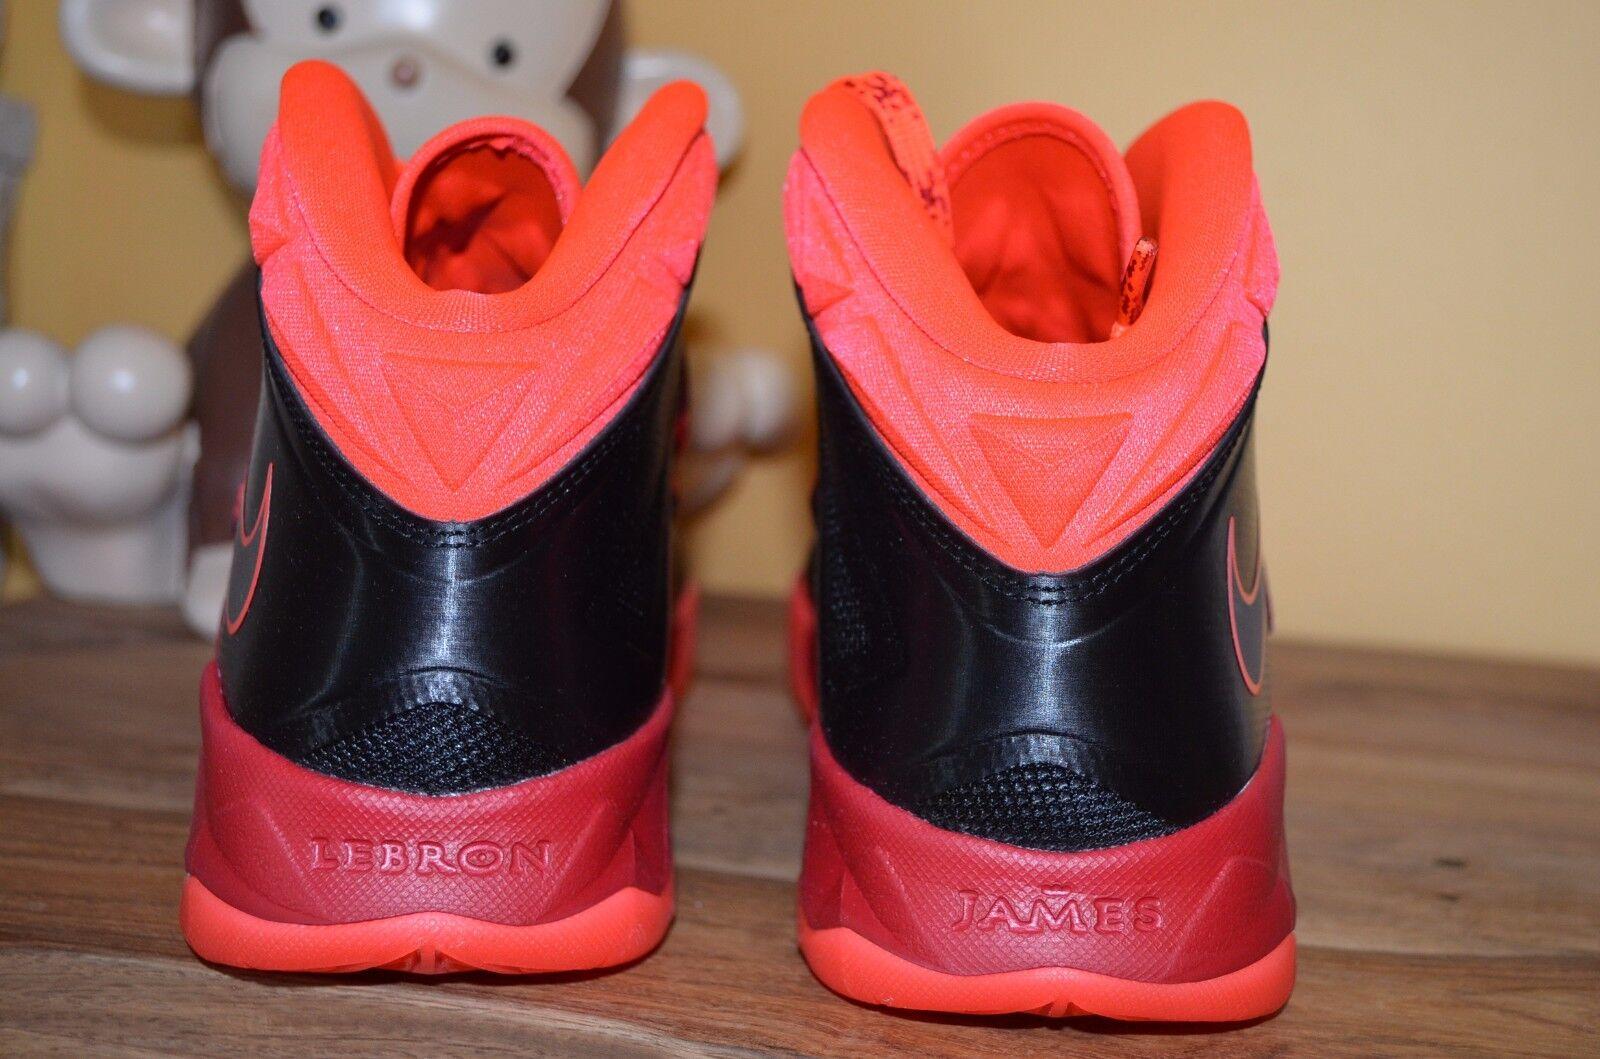 2161c39a79703 NEW NIKE ZOOM SOLDIER VII PP Black Orange Gym Red Red Red SZ 10 - 13 ...